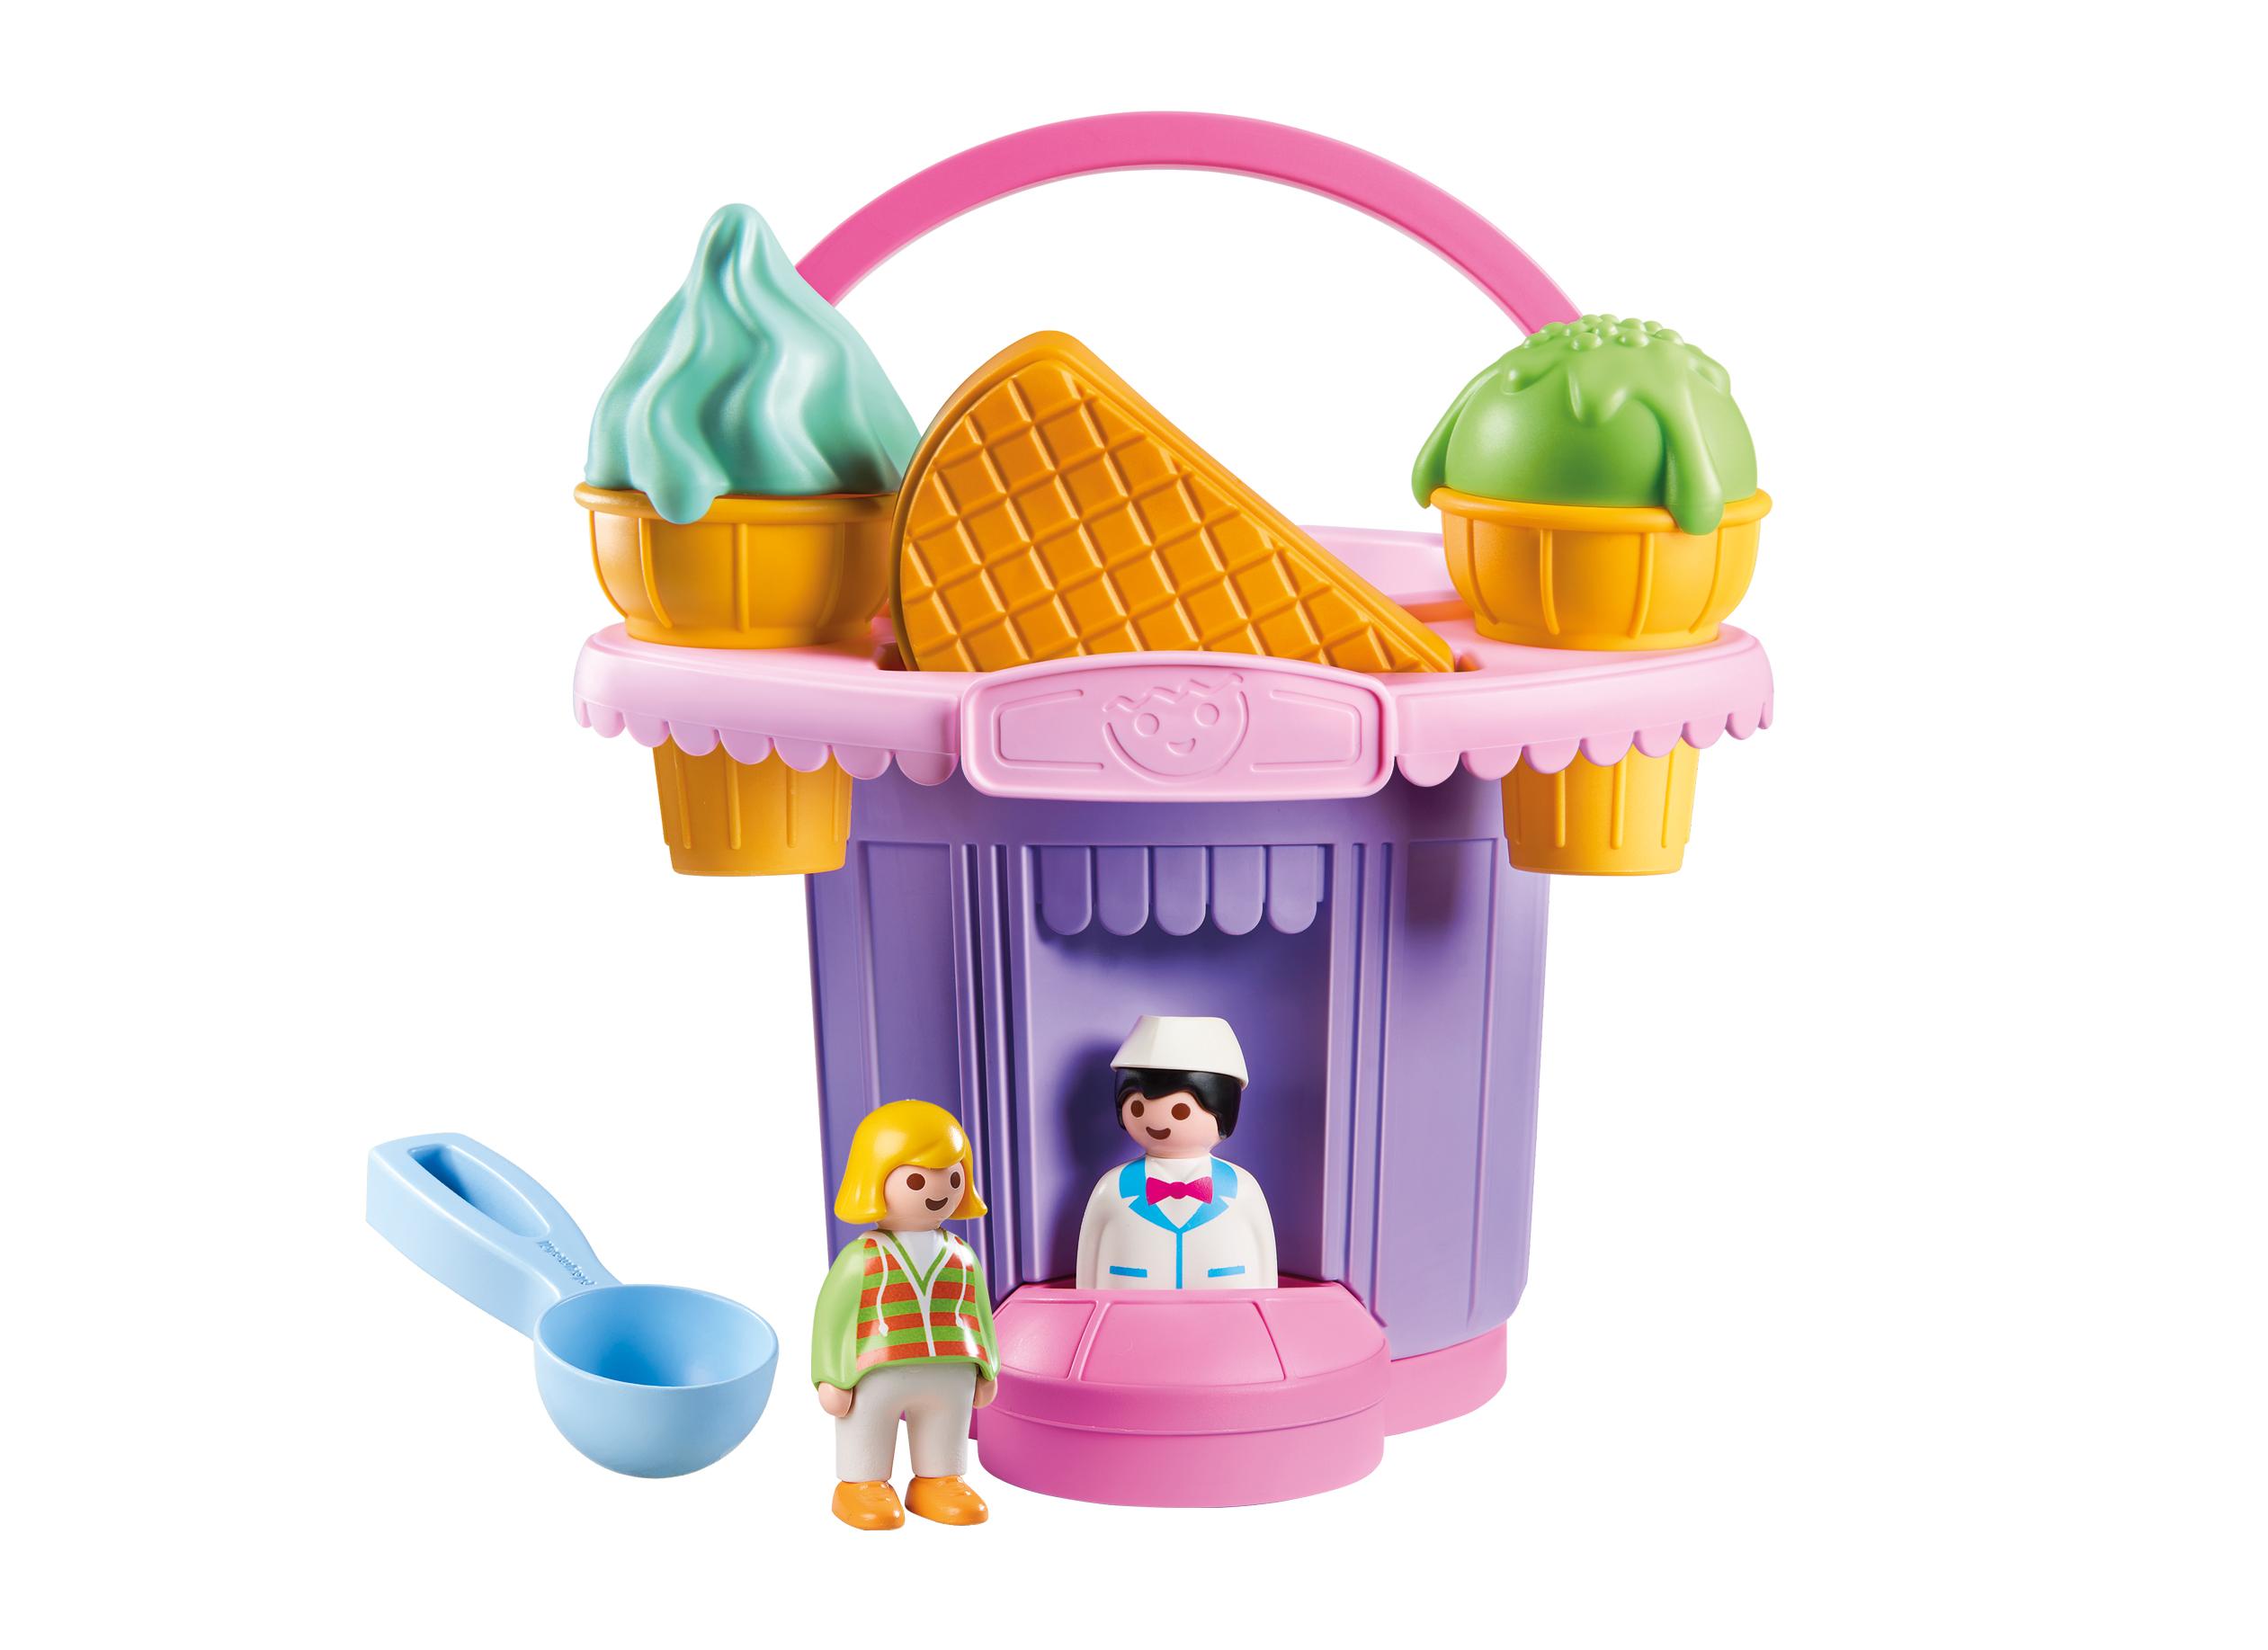 PLAYMOBIL Ice Cream Shop Sand Bucket $6.58 + FS w/ Walmart+ or on orders $35+